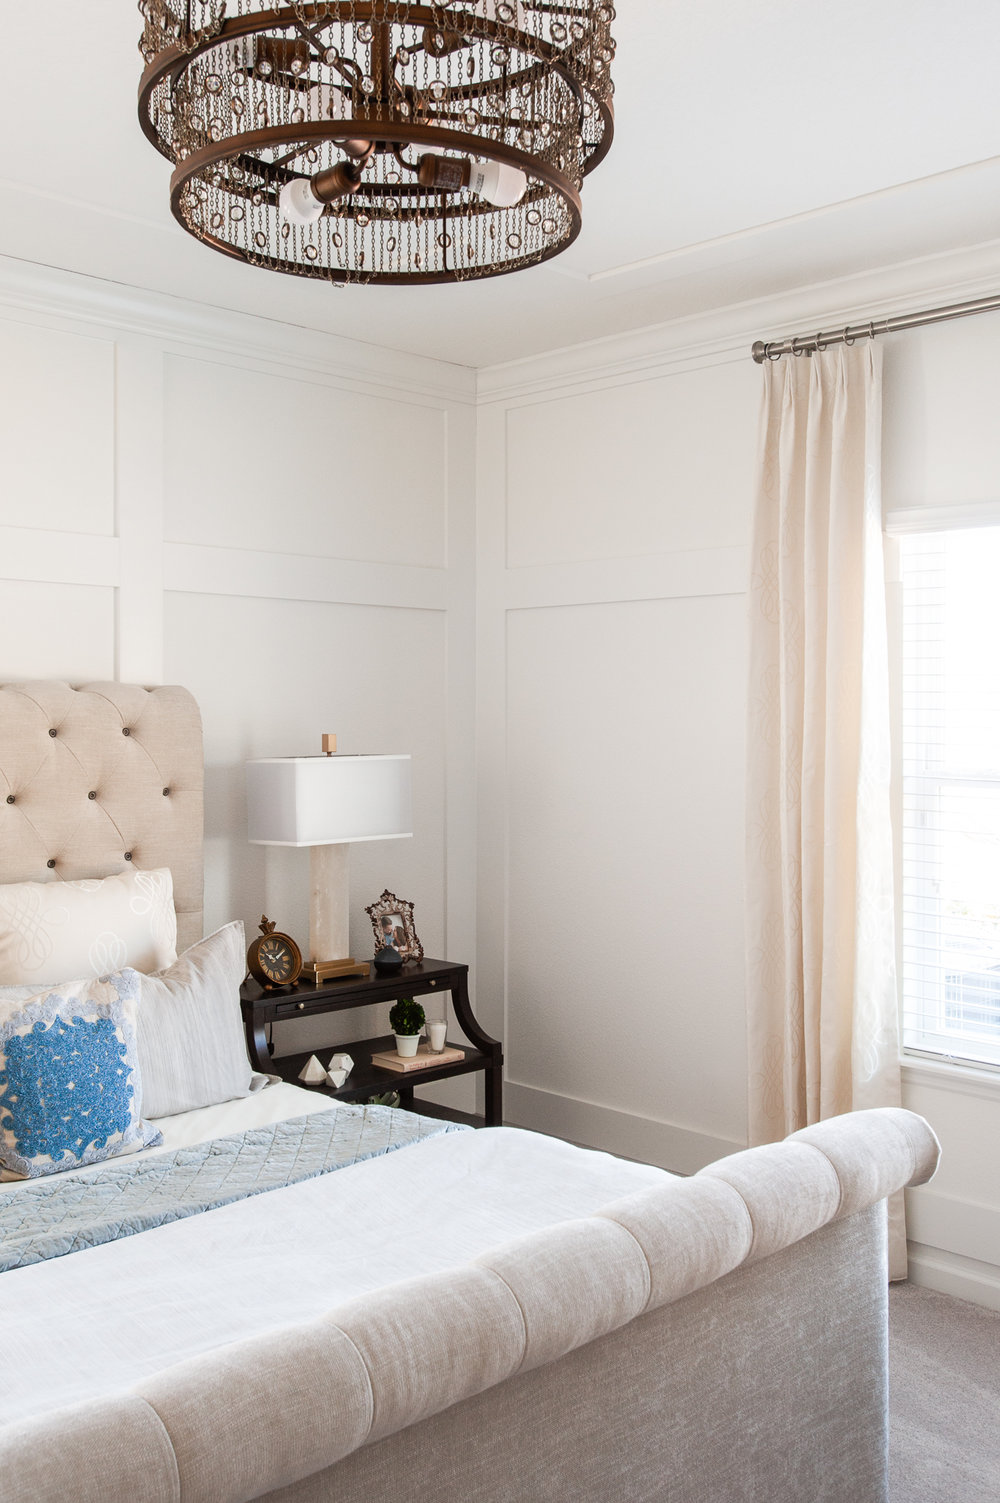 Micamy_Interior Designer_Design_Interior_Model_Merchandising_Owners_Suite_Universal_Furniture_Traditional_Transitional_Upholstered_Headbooard_Bronze_Bedroom_Blue.jpg